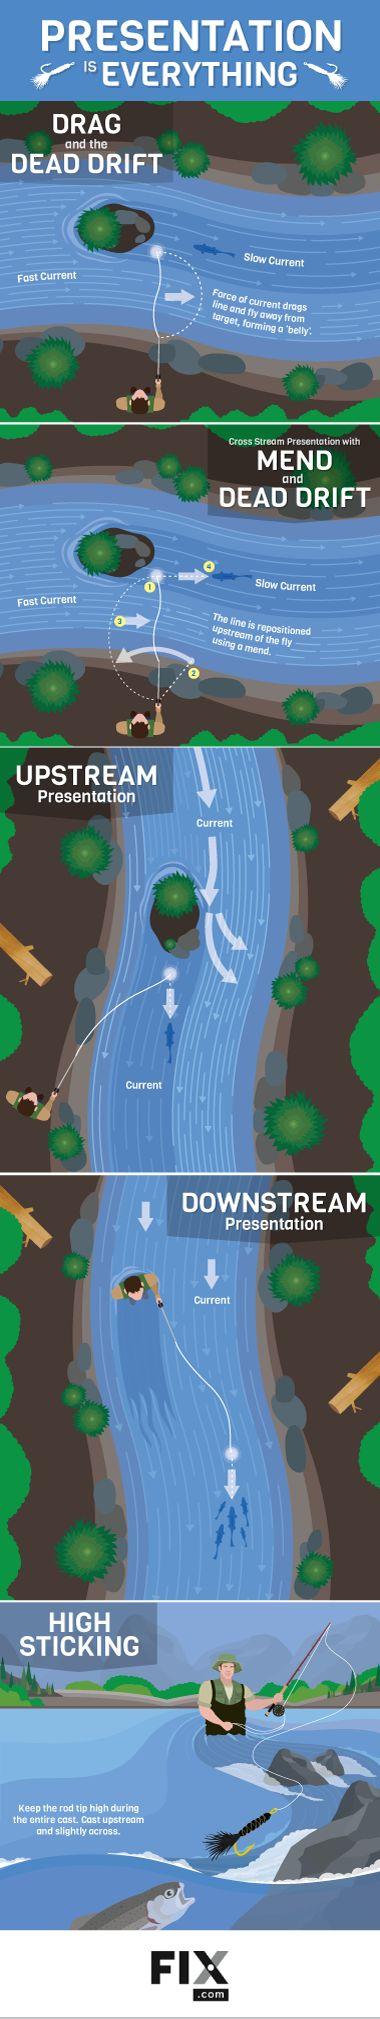 fly_fishing_tips